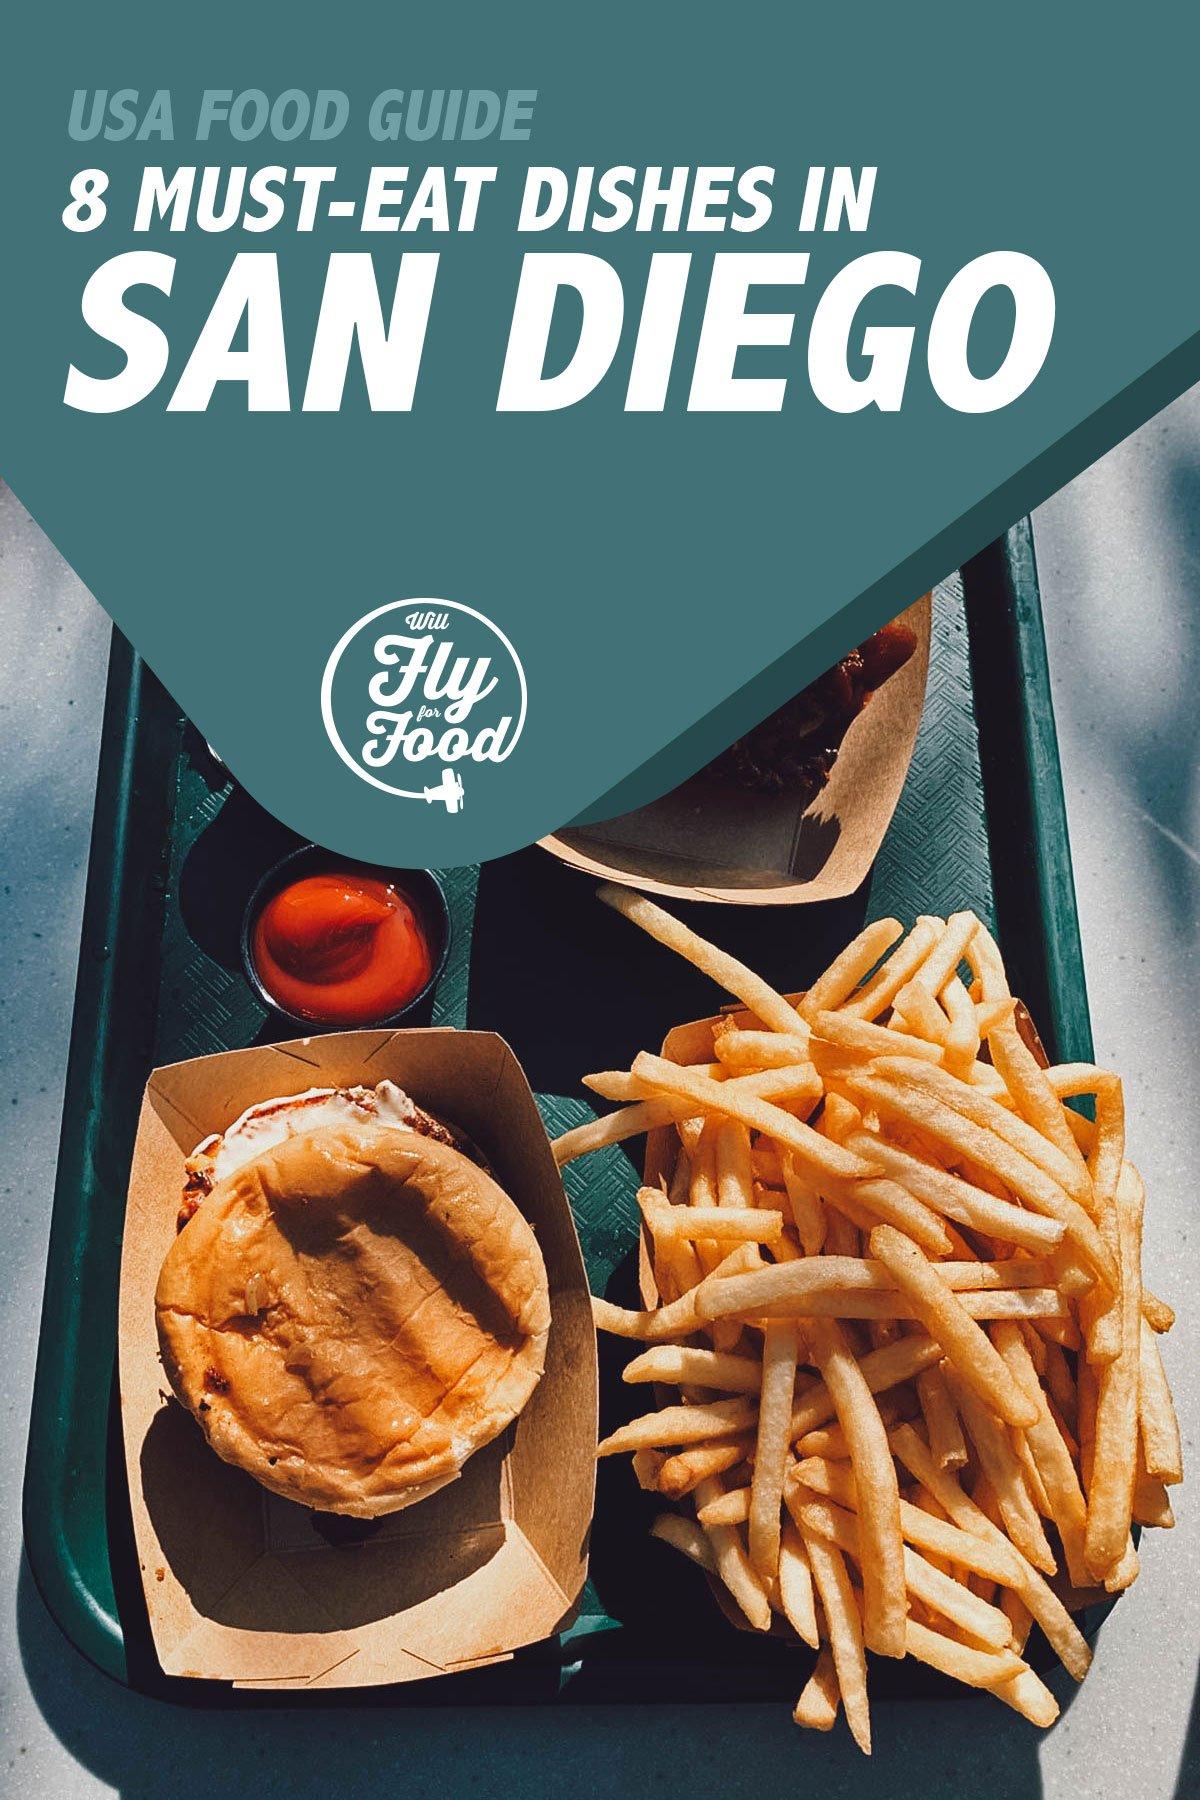 Flat-top burgers in San Diego